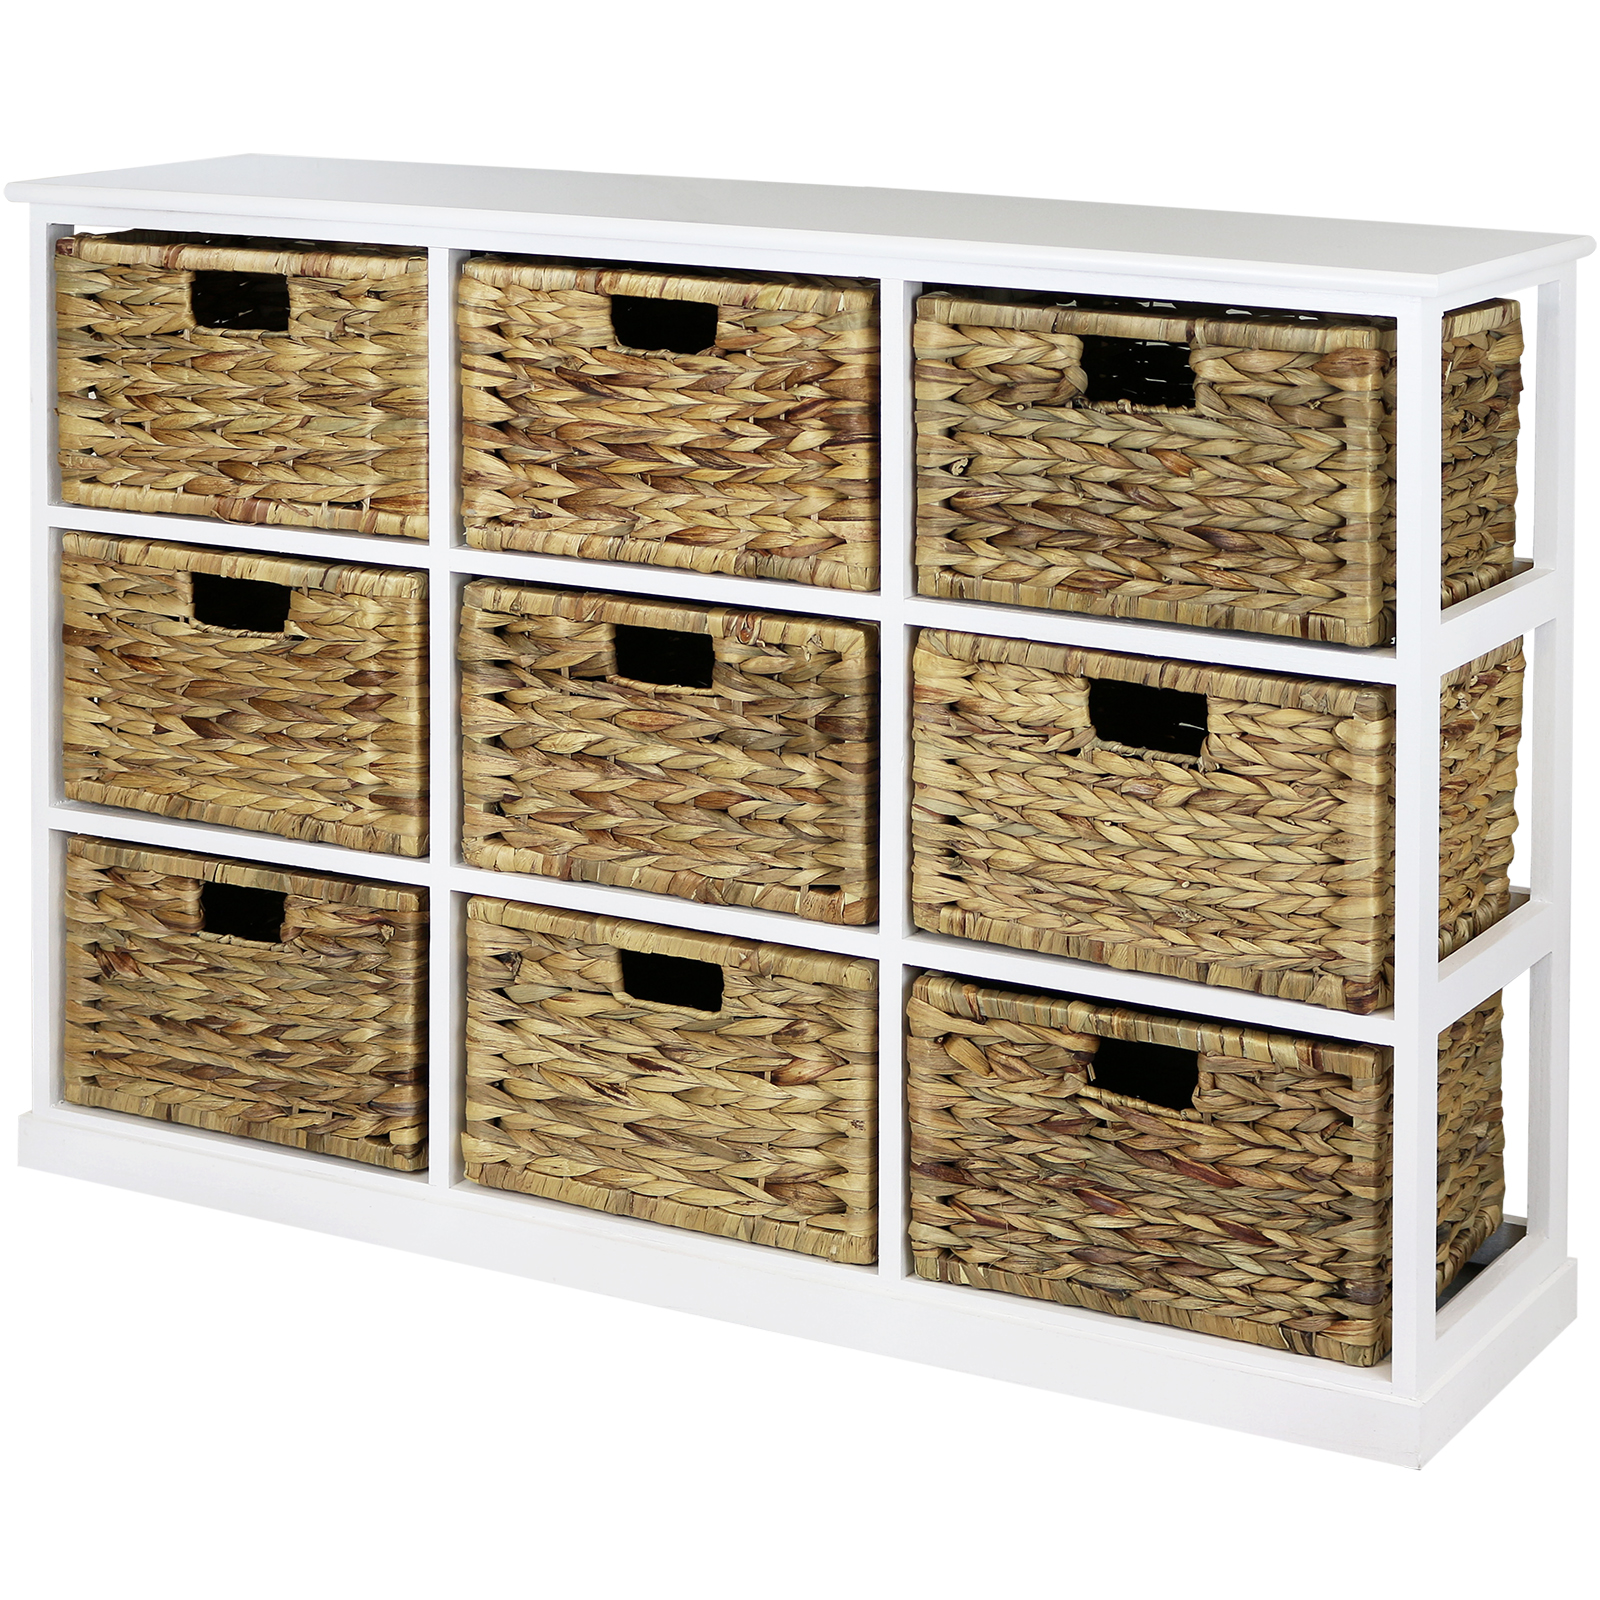 Damaged Kitchen Cabinets For Sale: SALE HARTLEYS 3x3 WHITE WOOD STORAGE UNIT 9 WICKER DRAWER